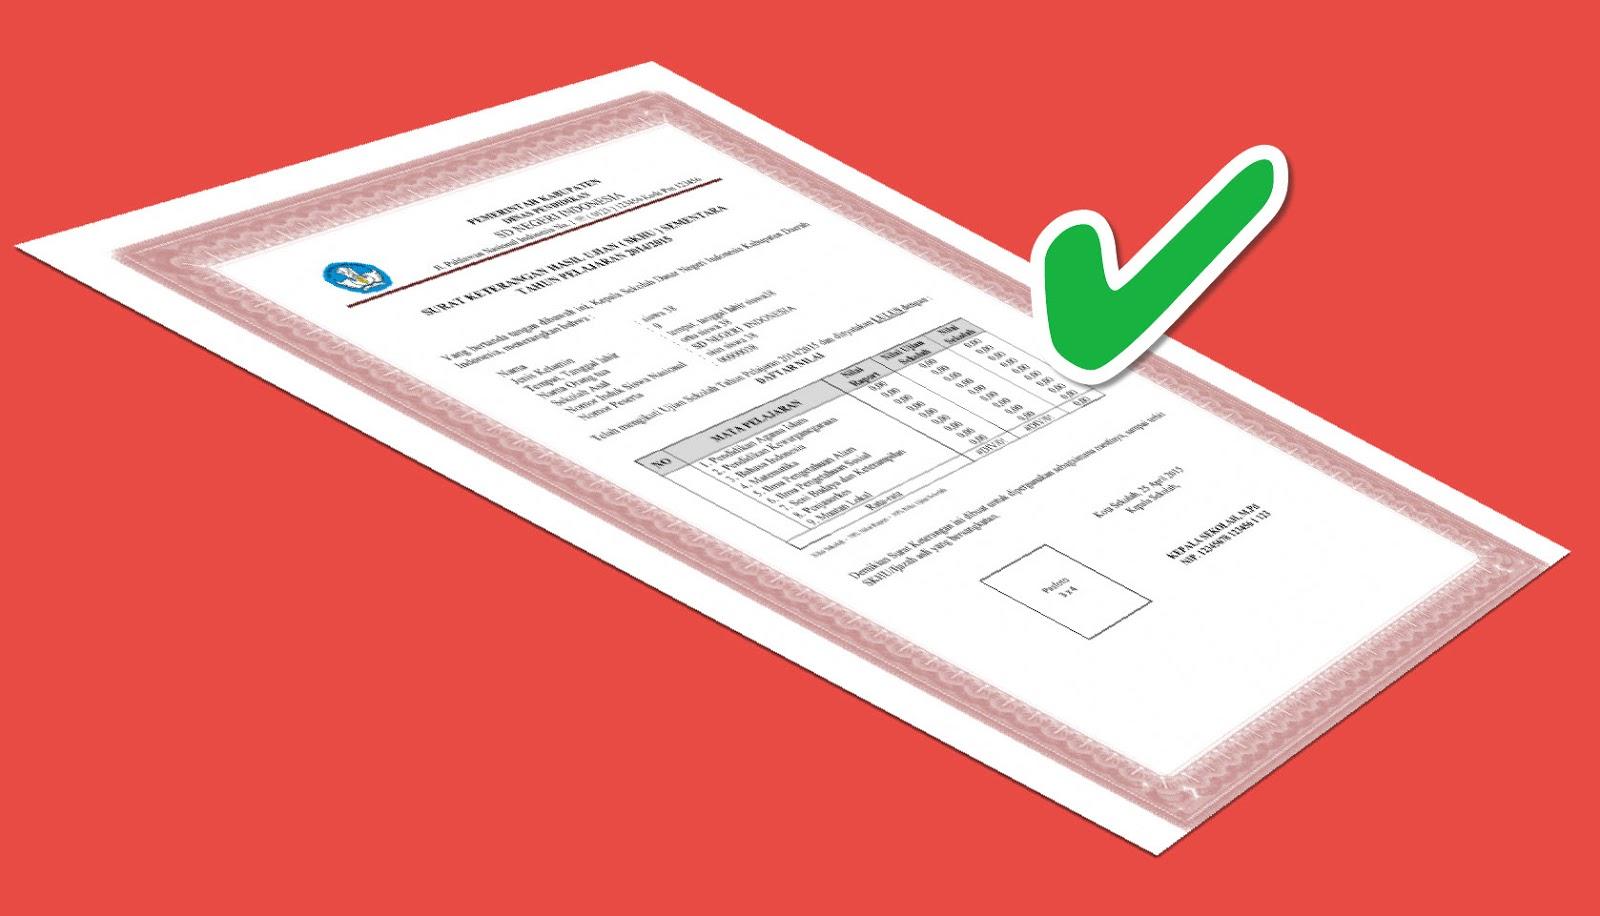 Contoh Blanko Ijazah 2017 Format Word dan Excel